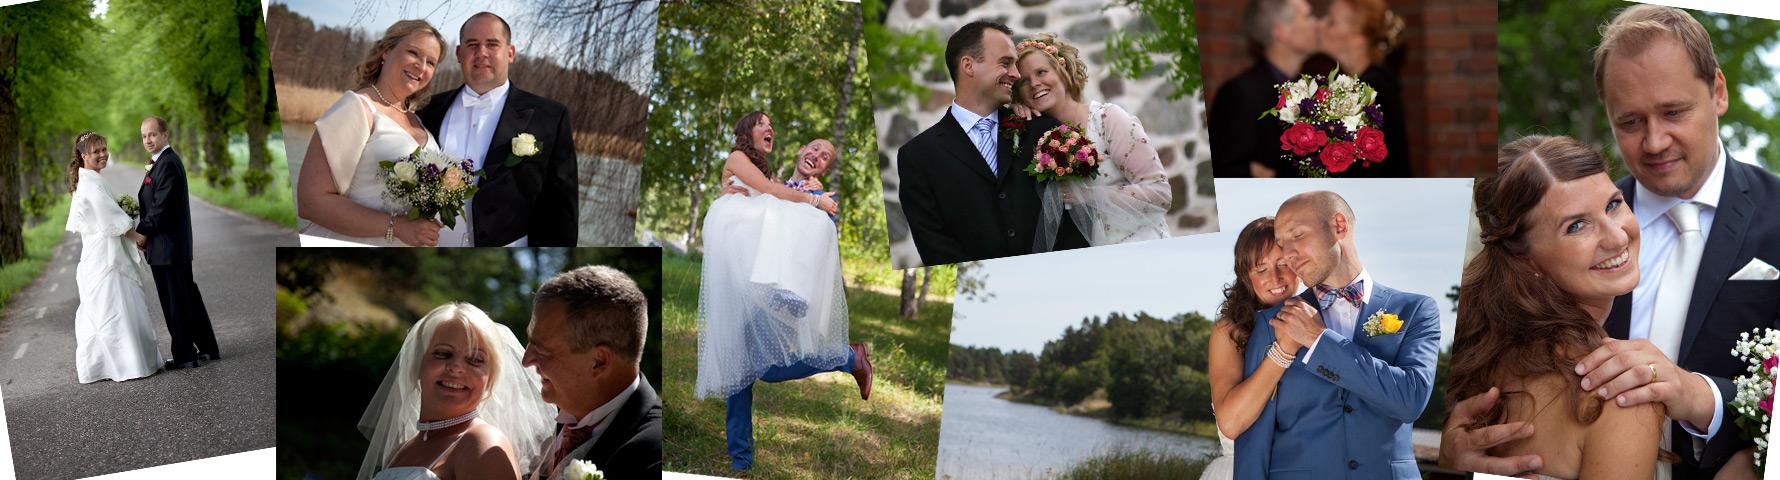 Bee Thalin Layout & foto - bröllopsfotograf